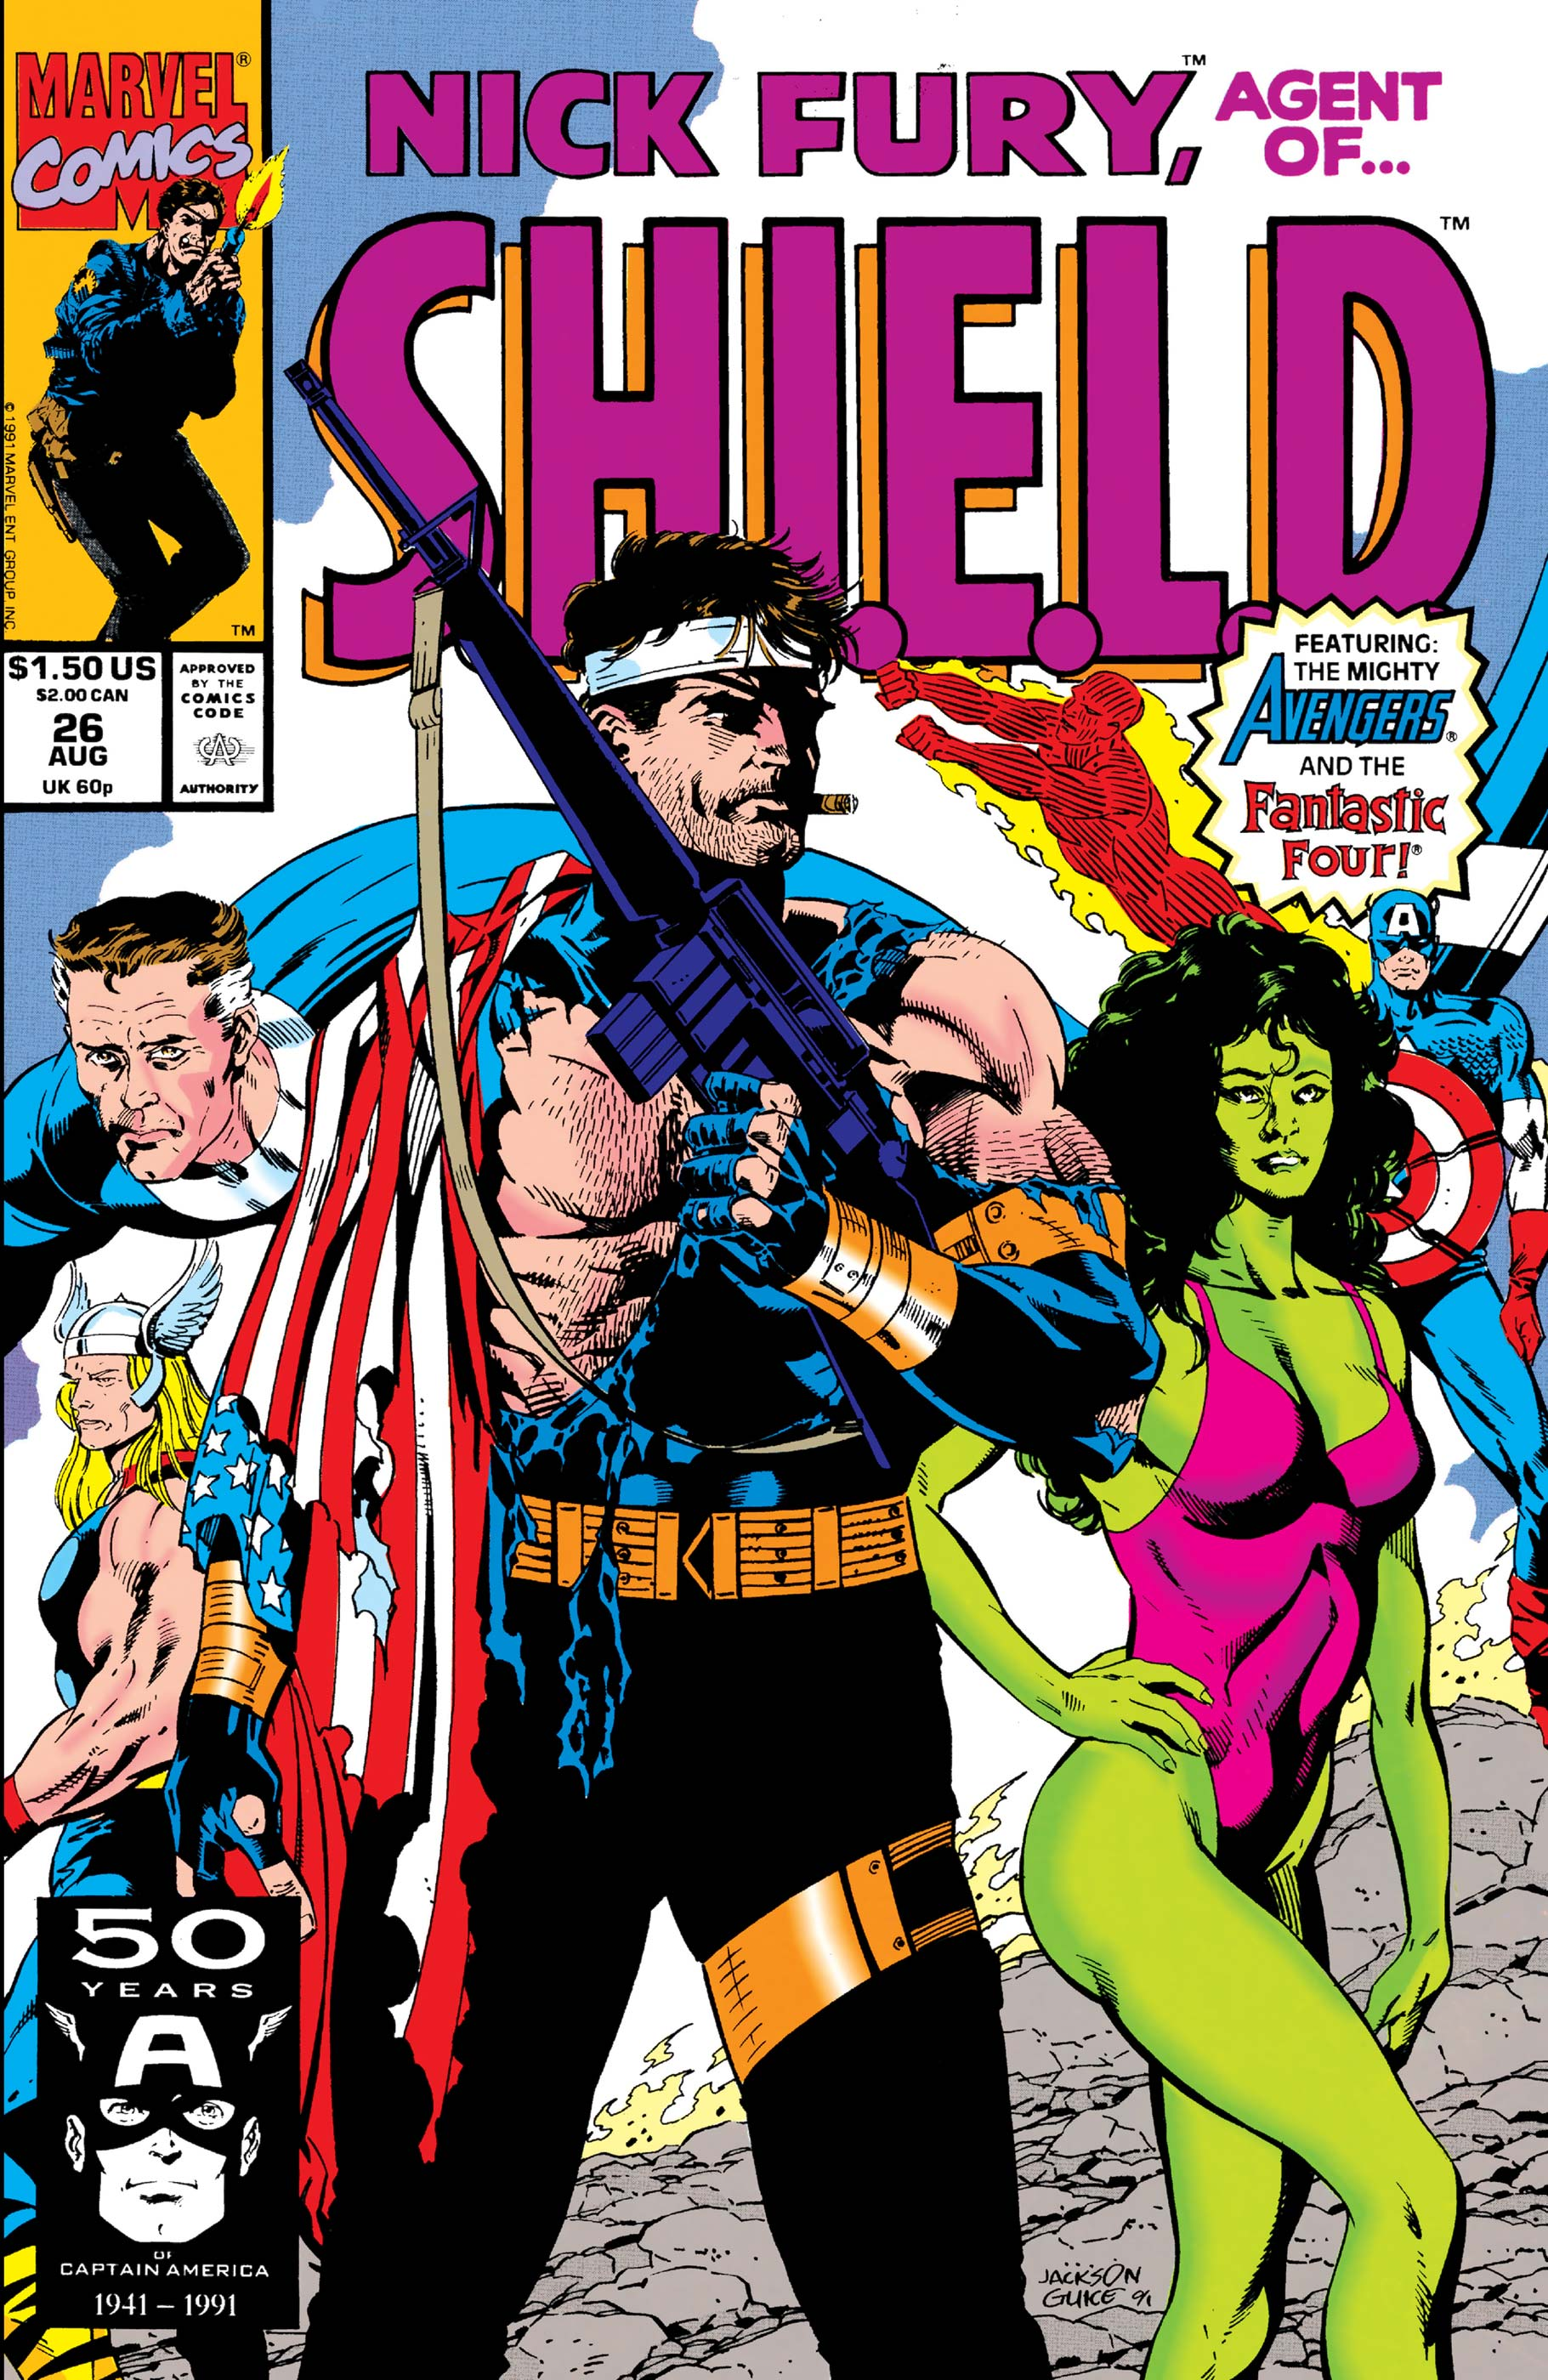 Nick Fury, Agent of S.H.I.E.L.D. (1989) #26